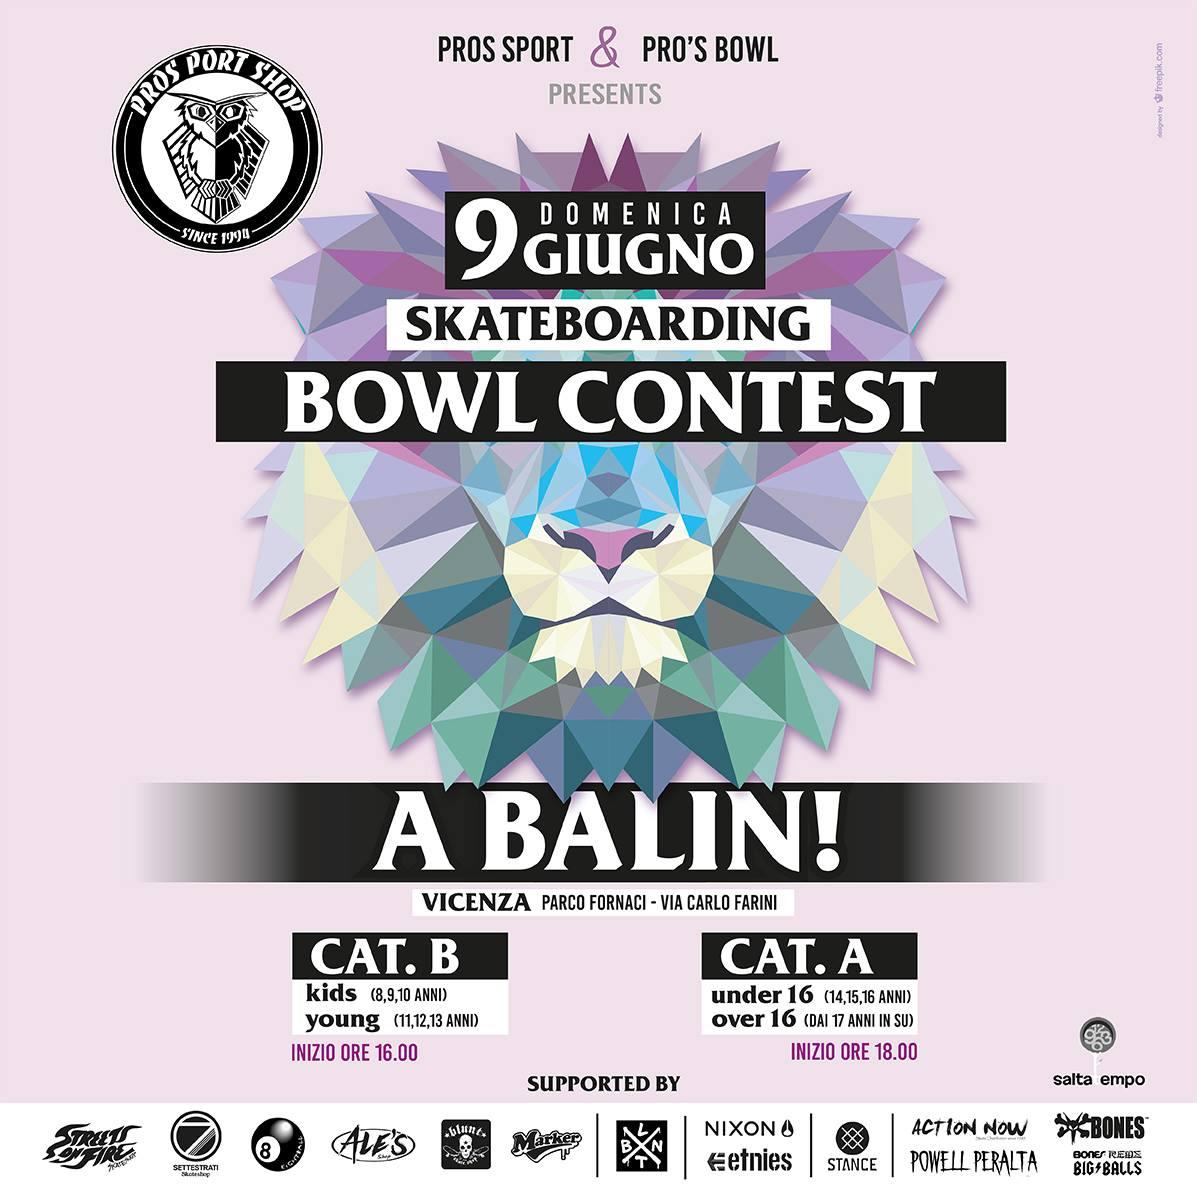 a-balin-contest-bowl-vicenza